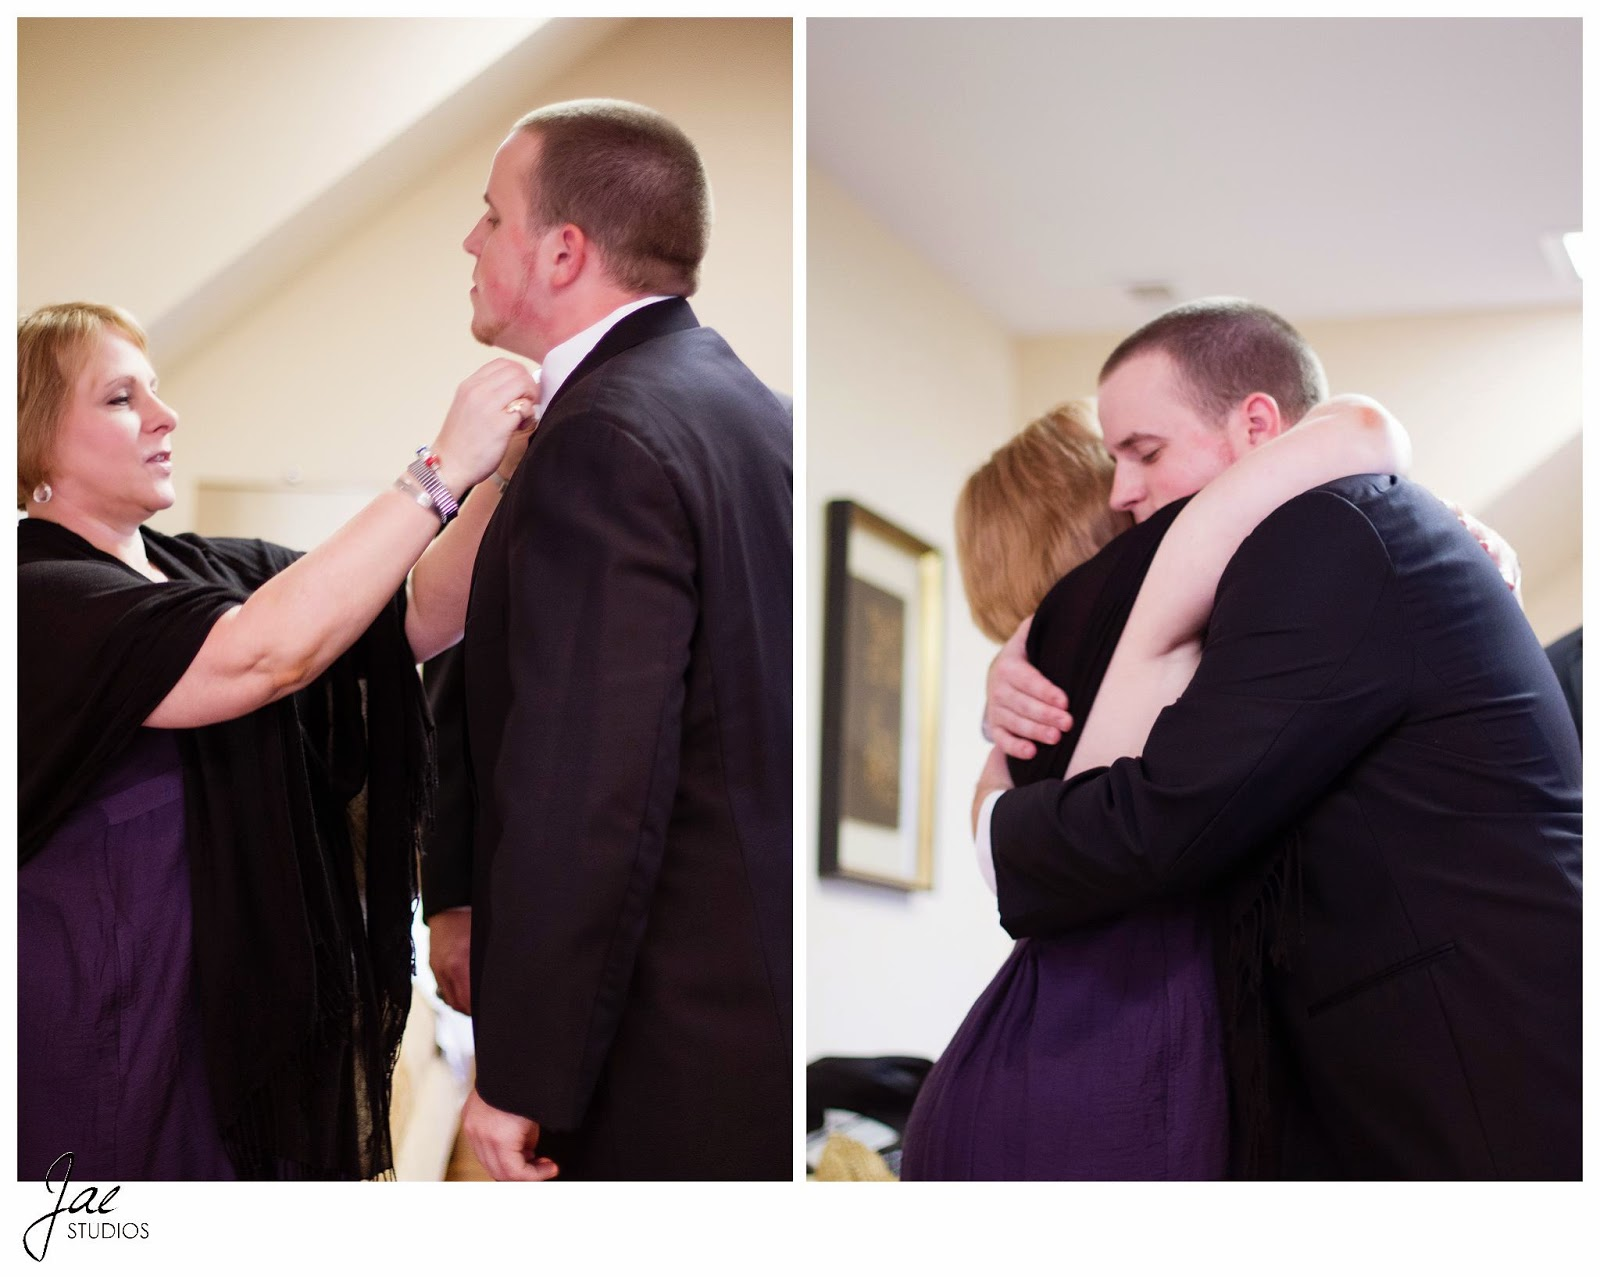 Jonathan and Julie, Bird cage, West Manor Estate, Wedding, Lynchburg, Virginia, Jae Studios, mother, groom, hug, fixing bow tie, purple, tuxedo, dress